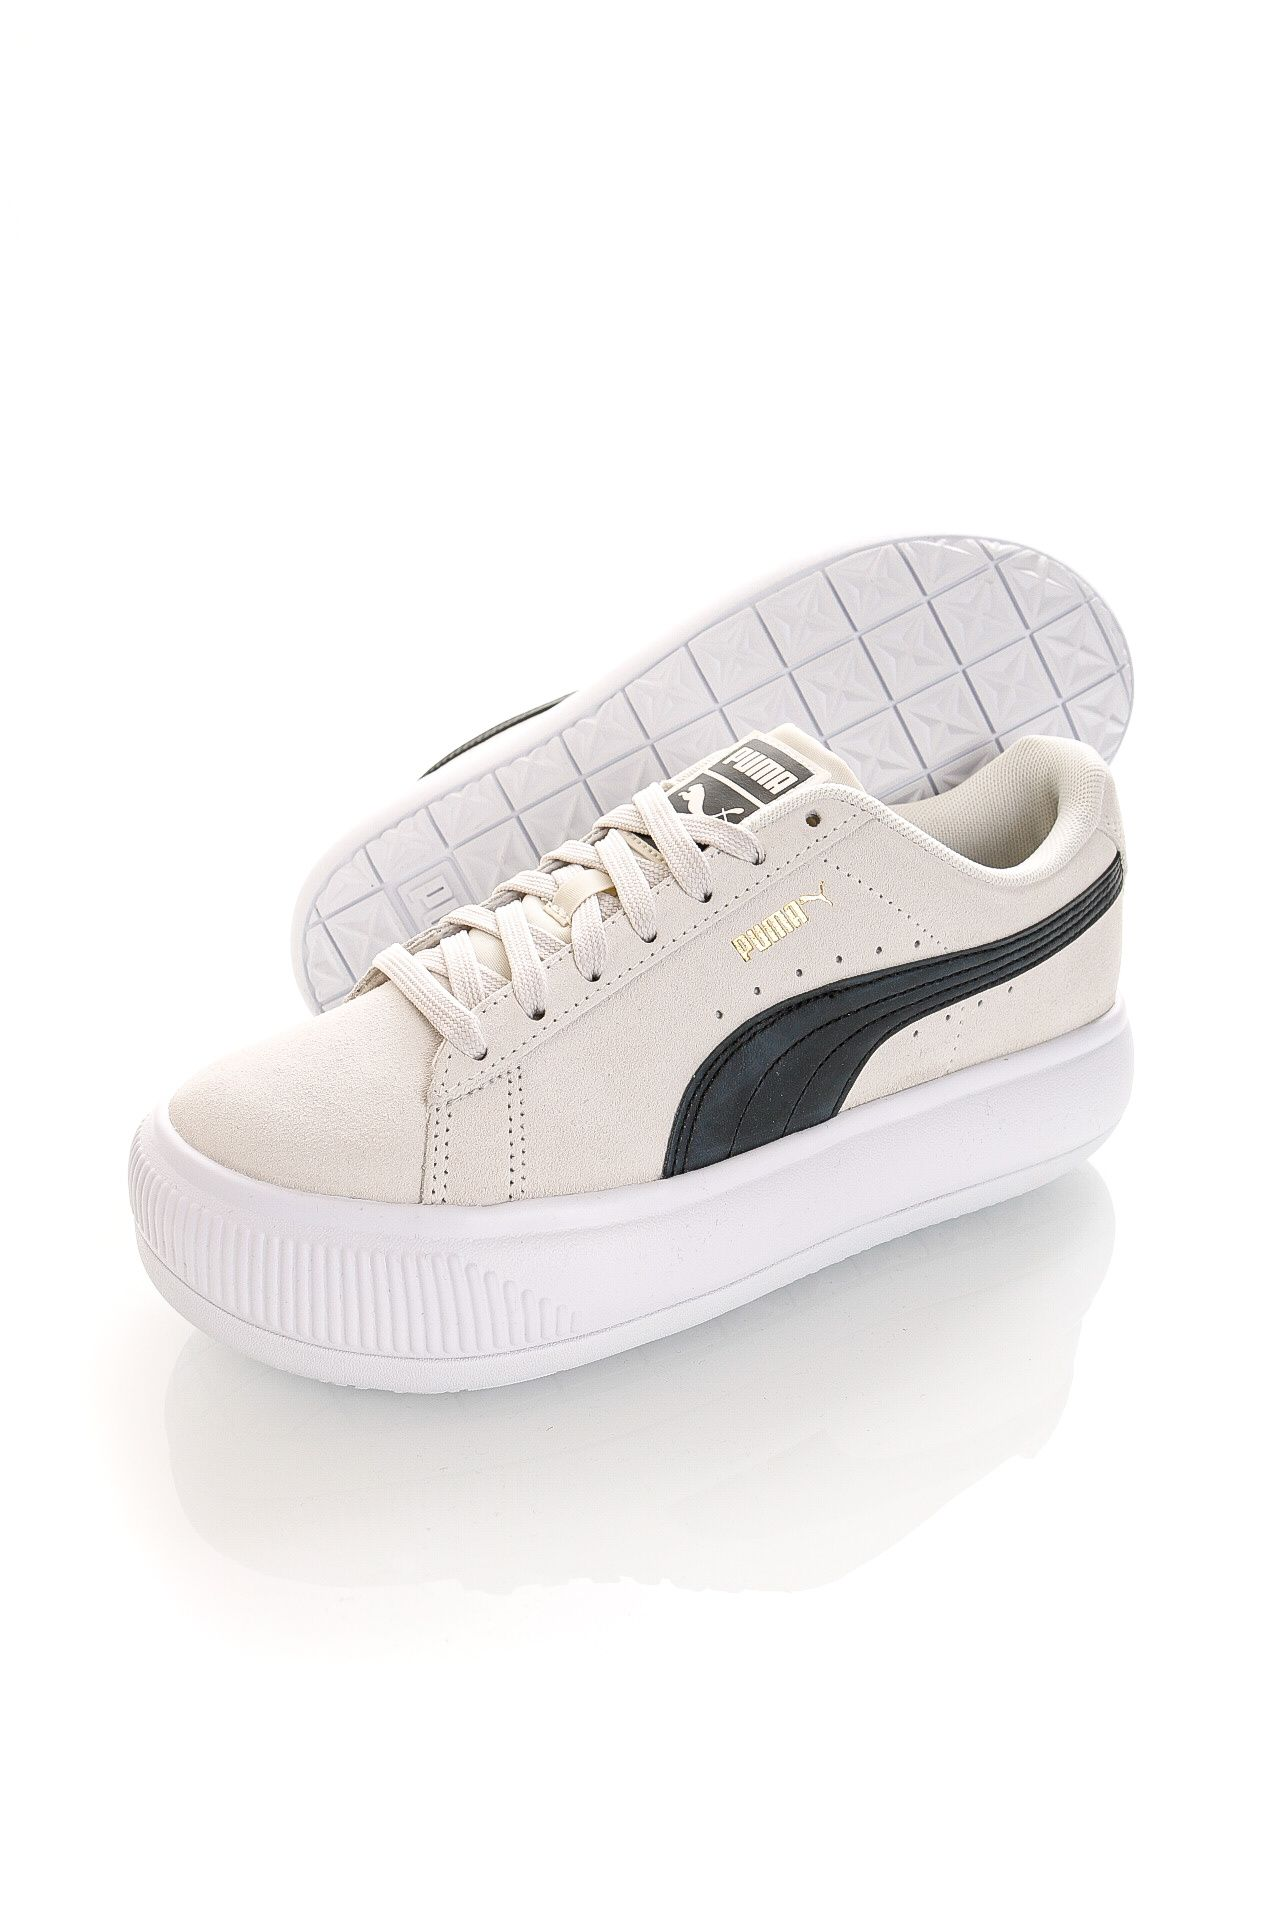 Afbeelding van Puma Sneakers Suede Mayu Marshmallow-Puma White-Puma Black 38068601